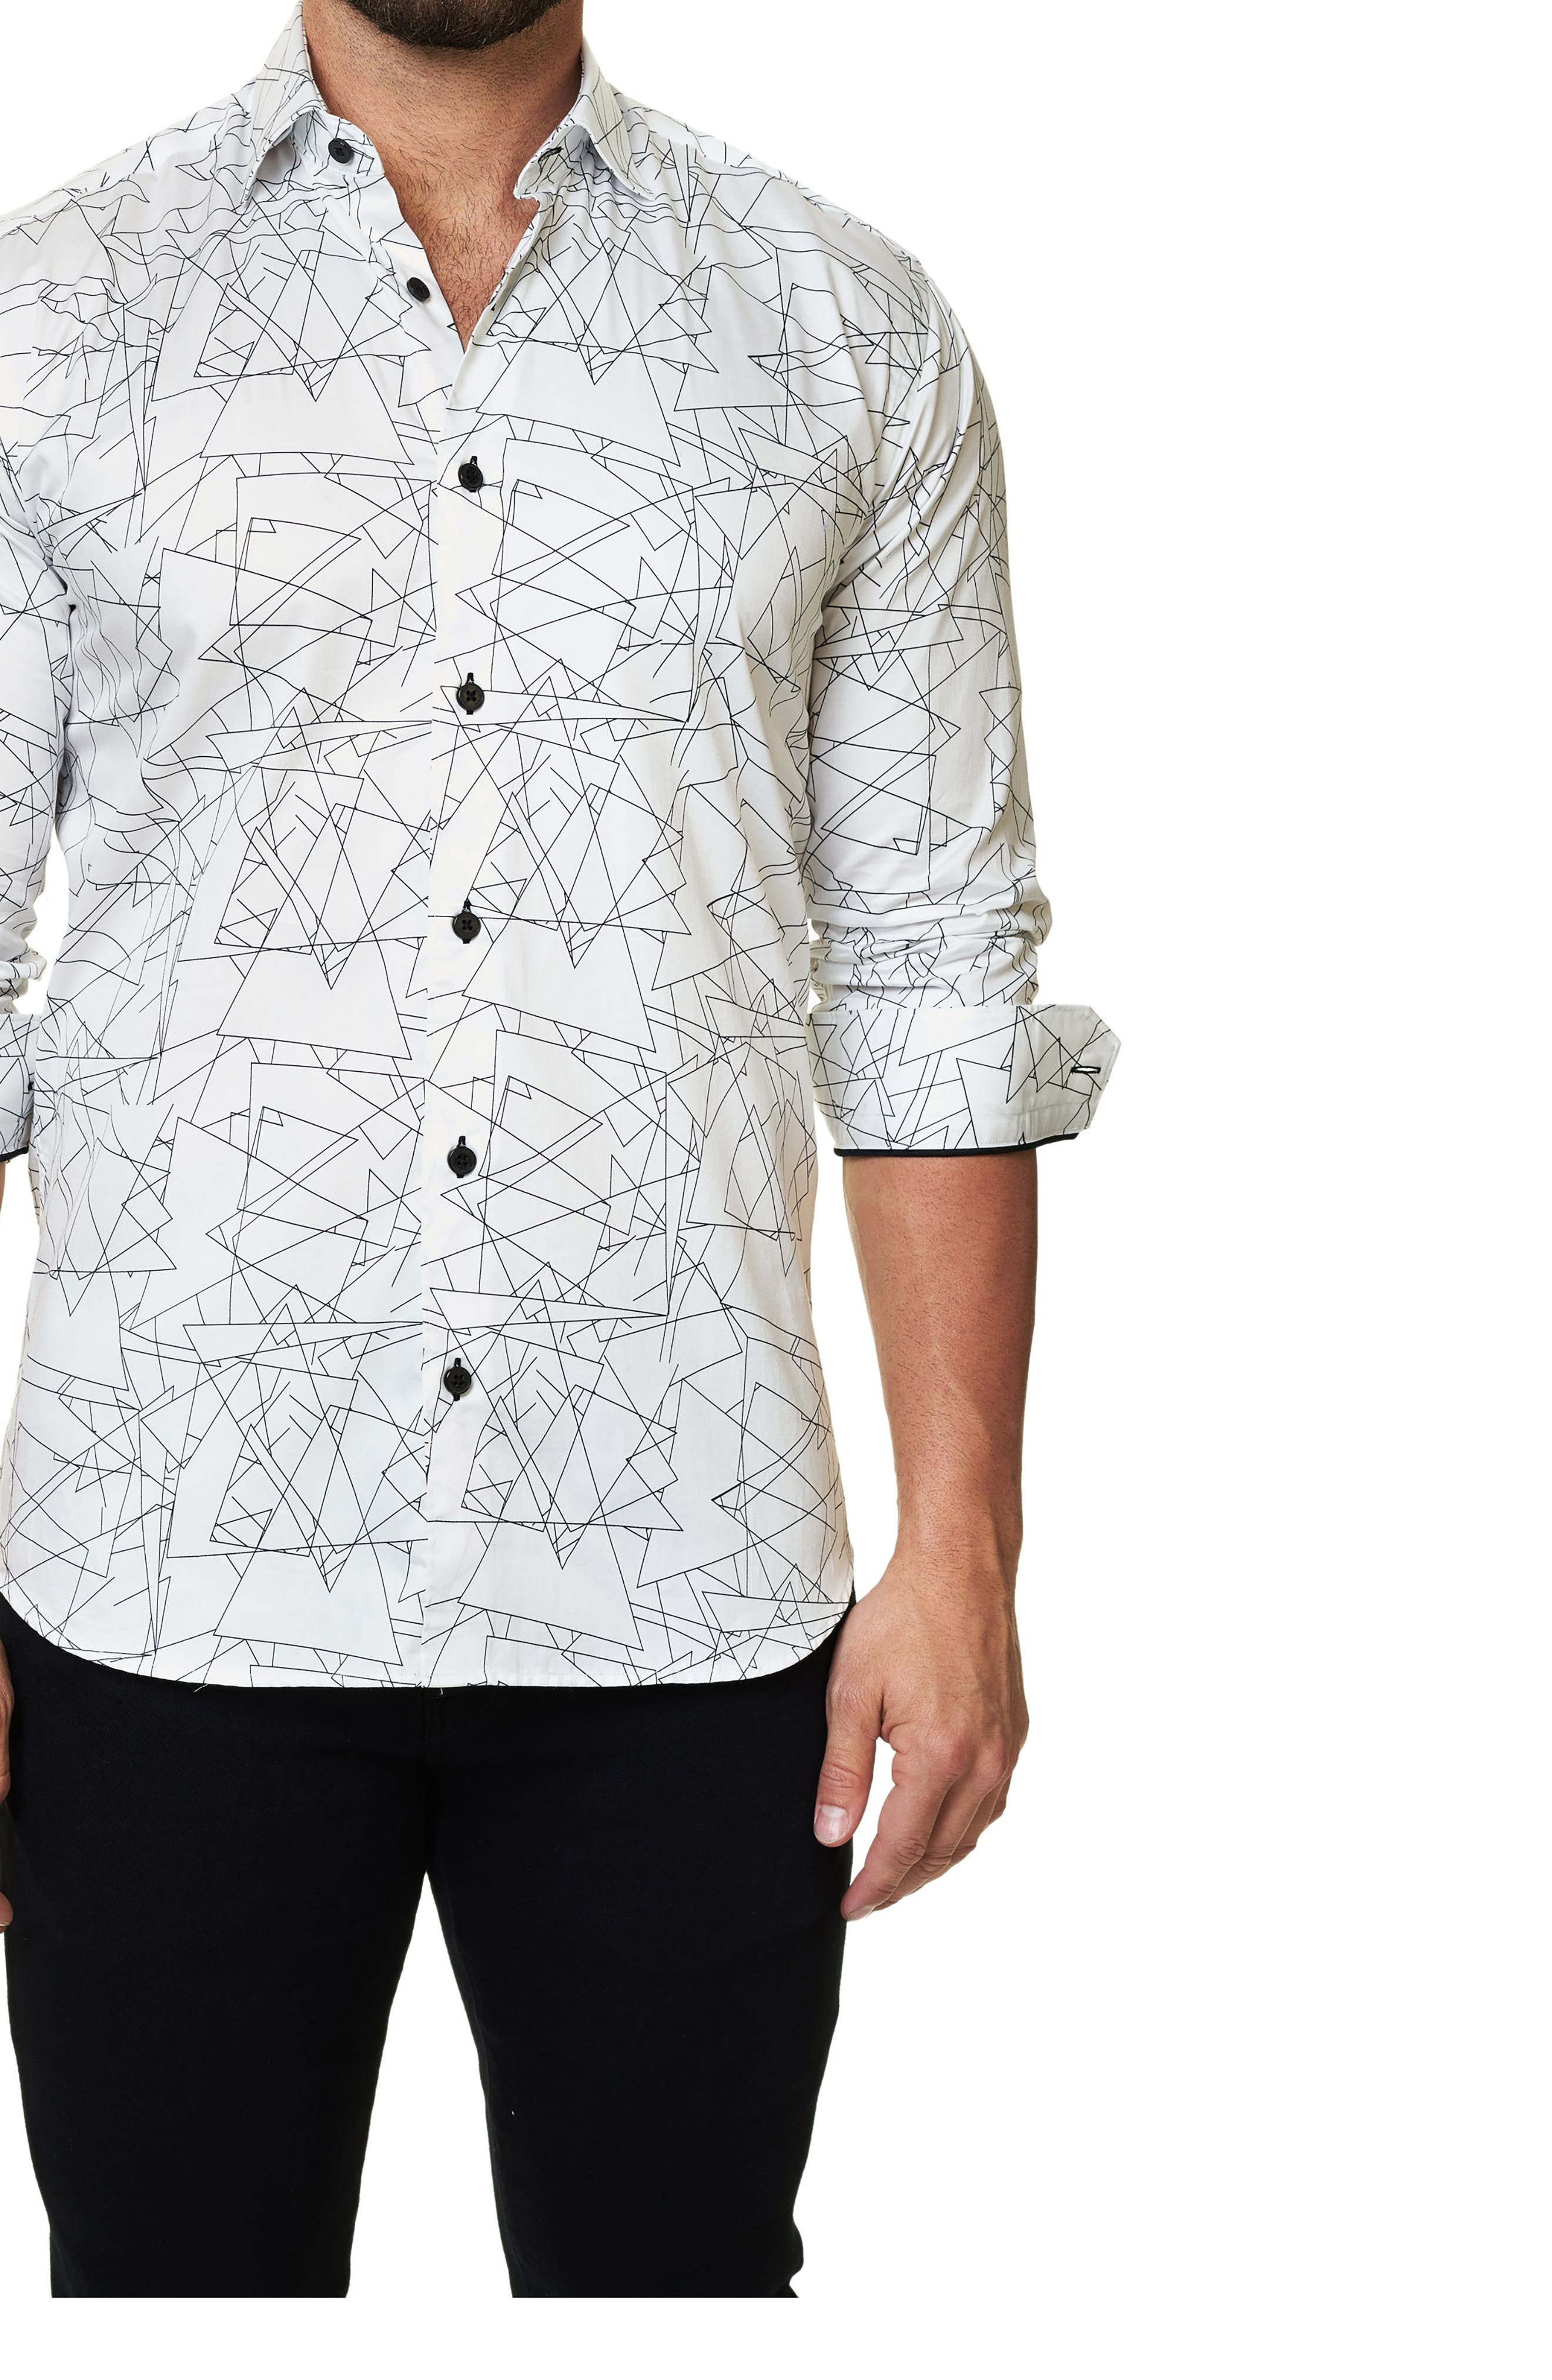 Alternate Image 1 Selected - Maceoo Trim Fit Geo Print Sport Shirt